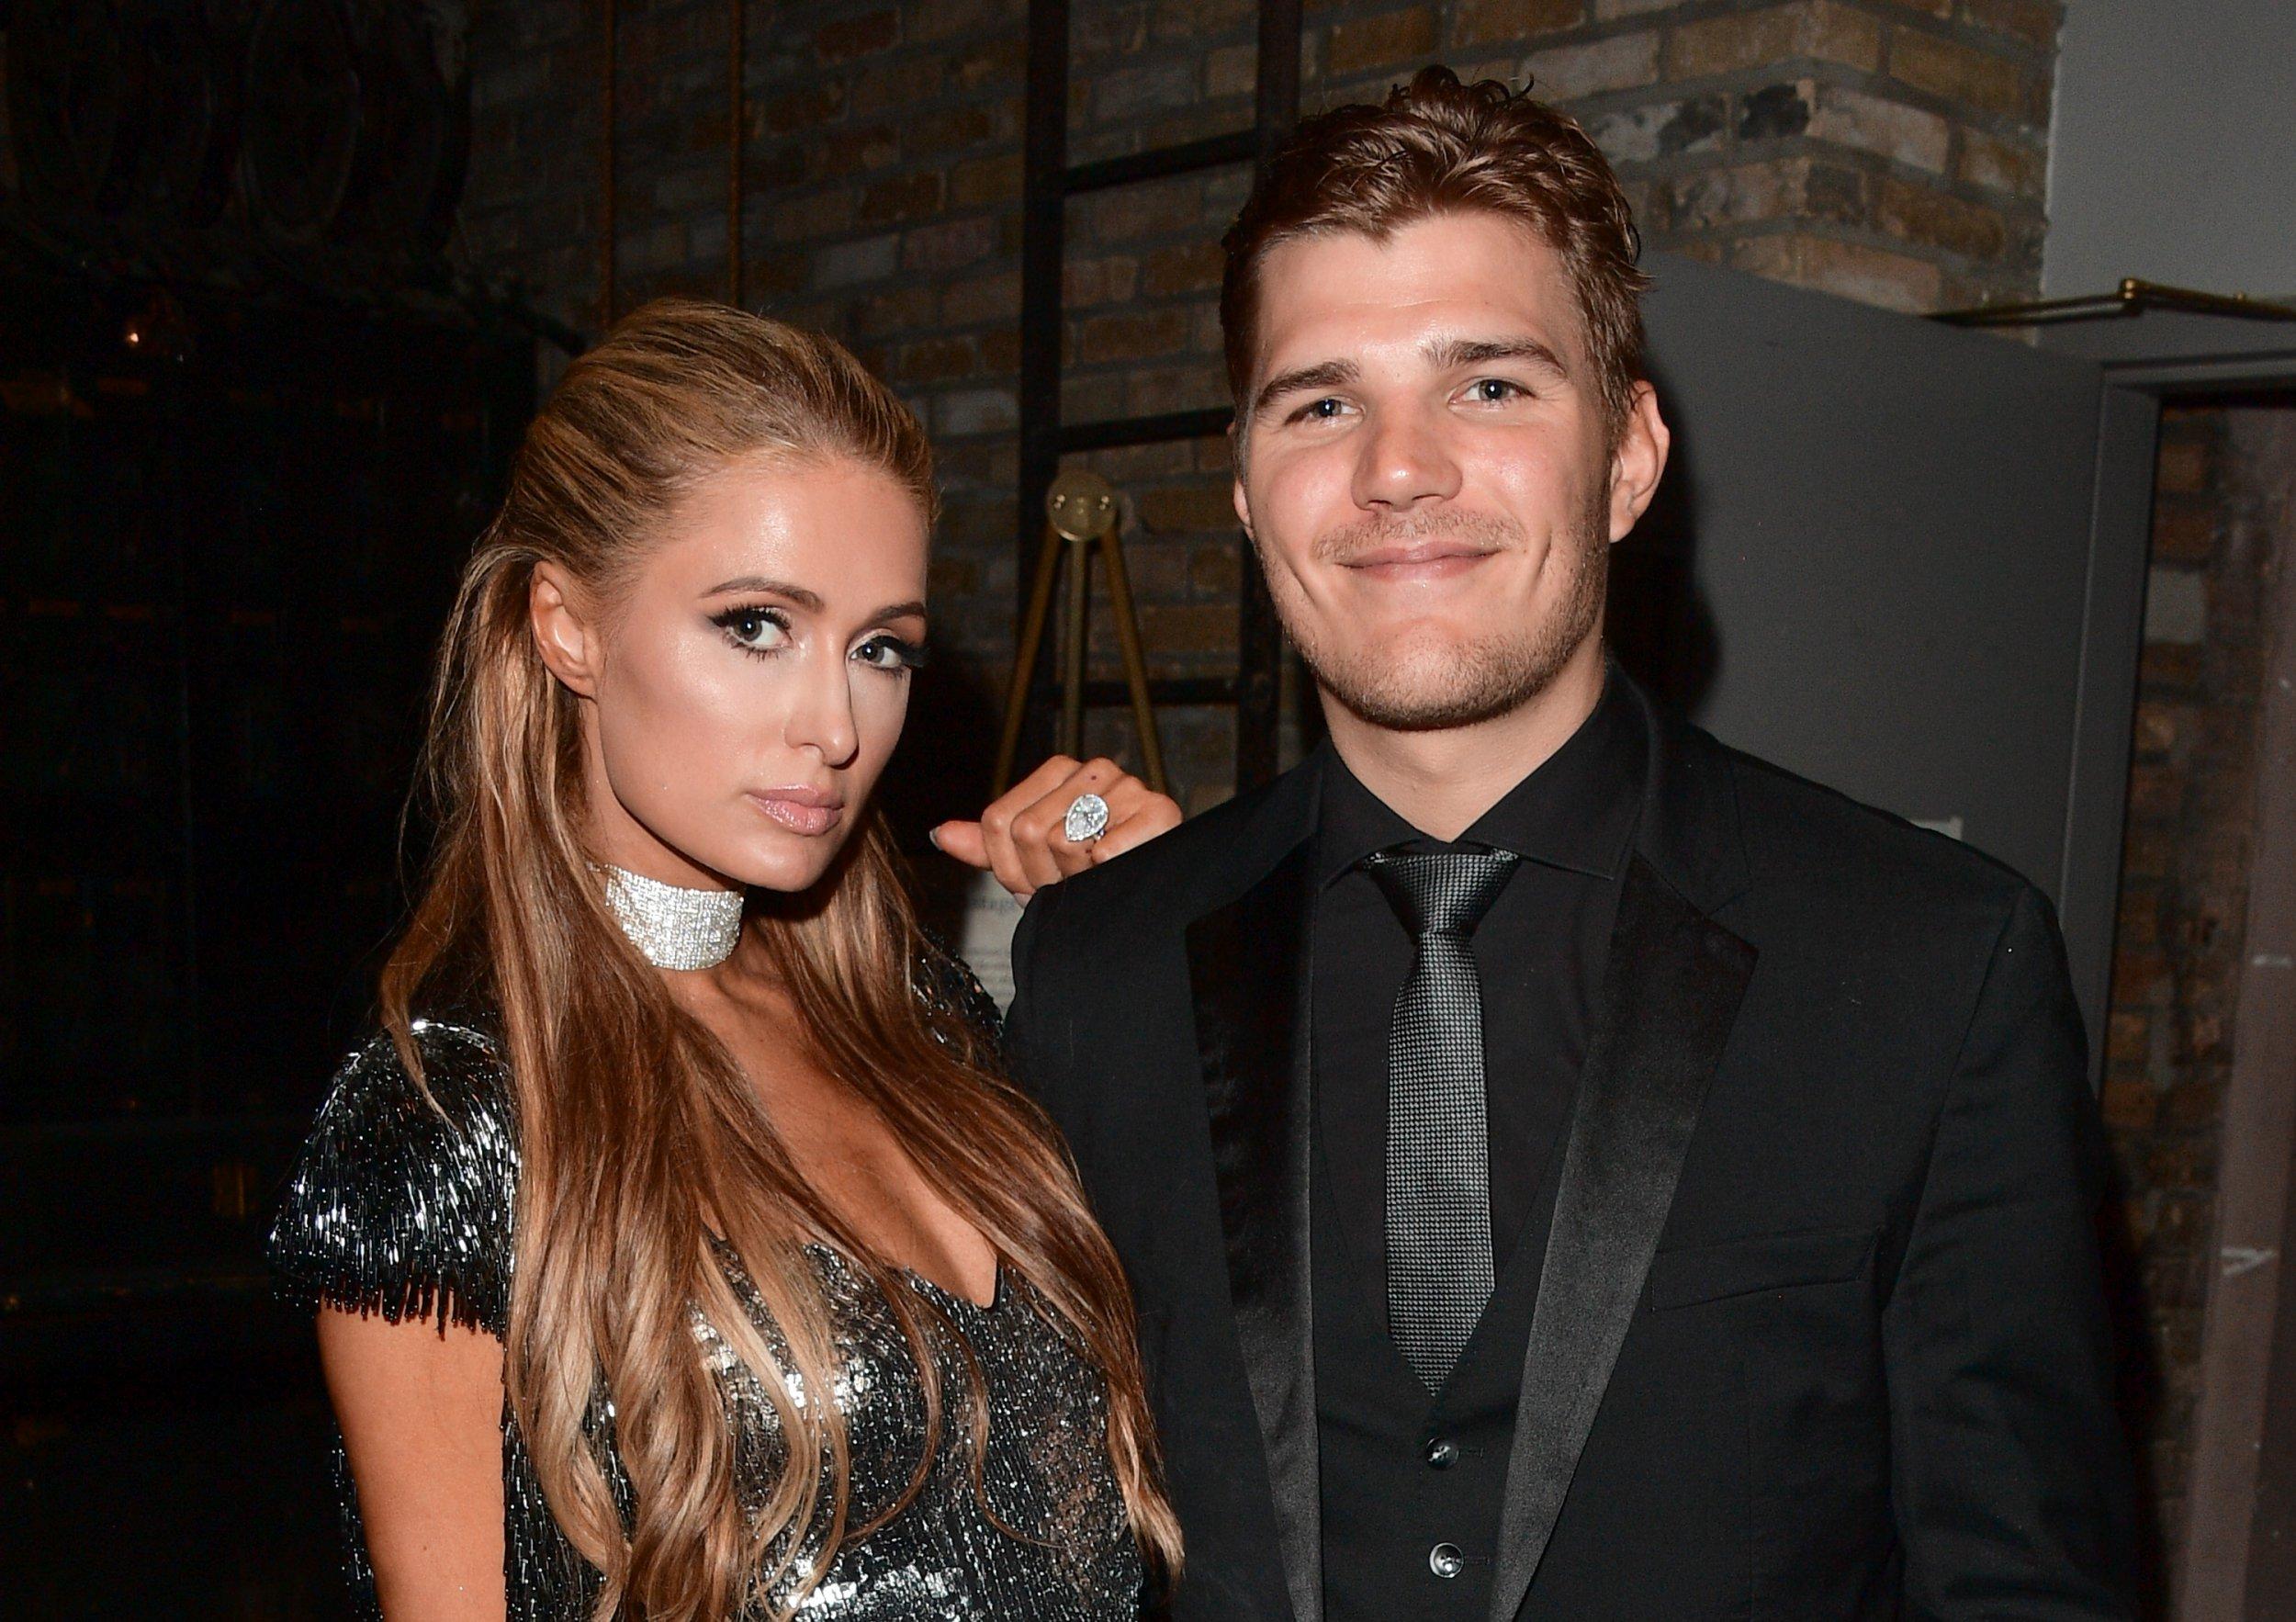 Paris Hilton 'seeking sperm donor' following split from fiancé Chris Zylka